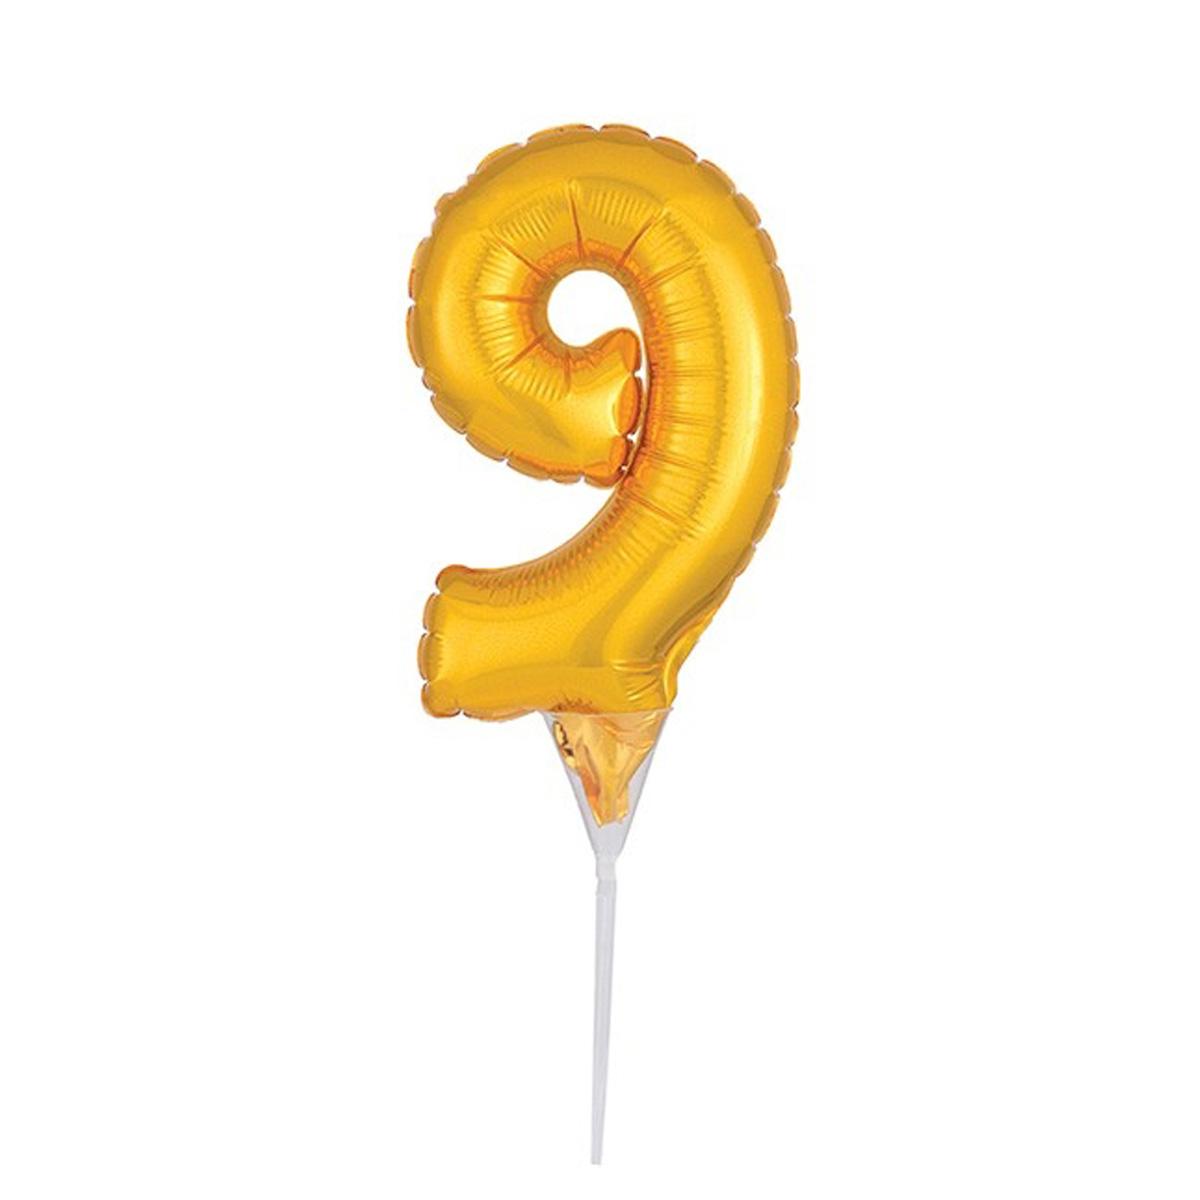 Cake Topper Luftballon Zahlenballon Gold - Zahl 9